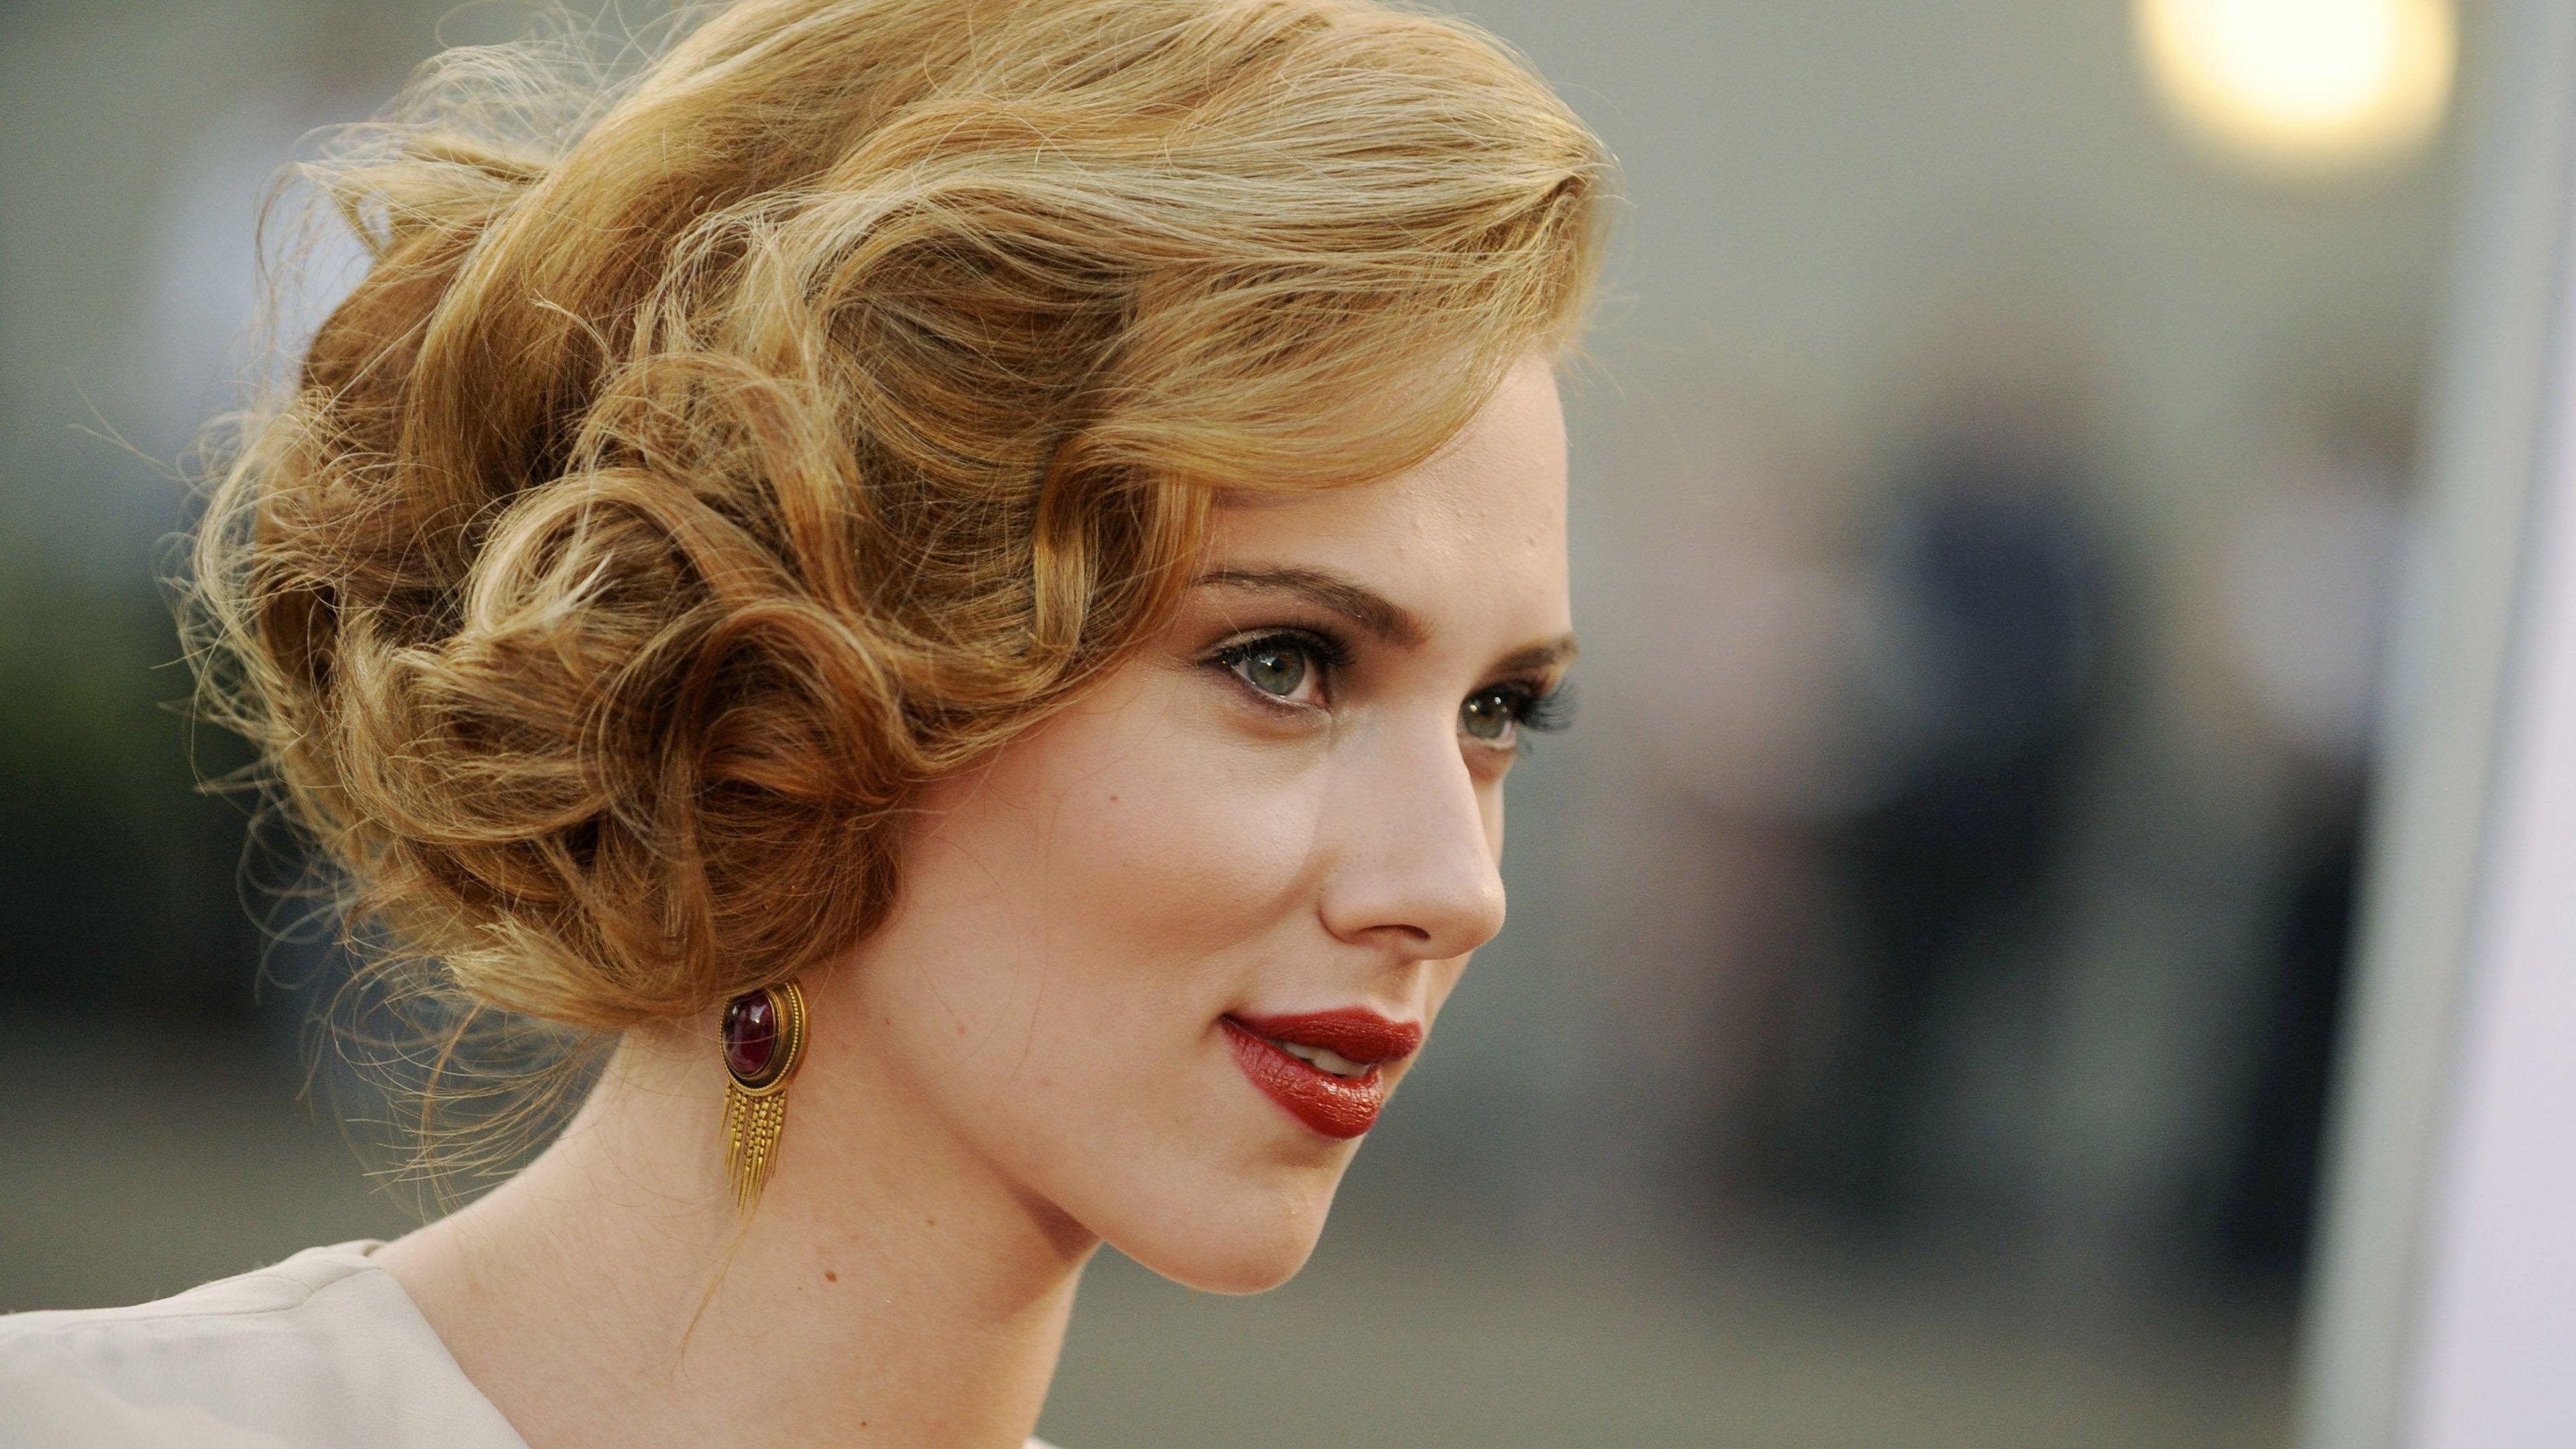 Scarlett Johansson surgeries